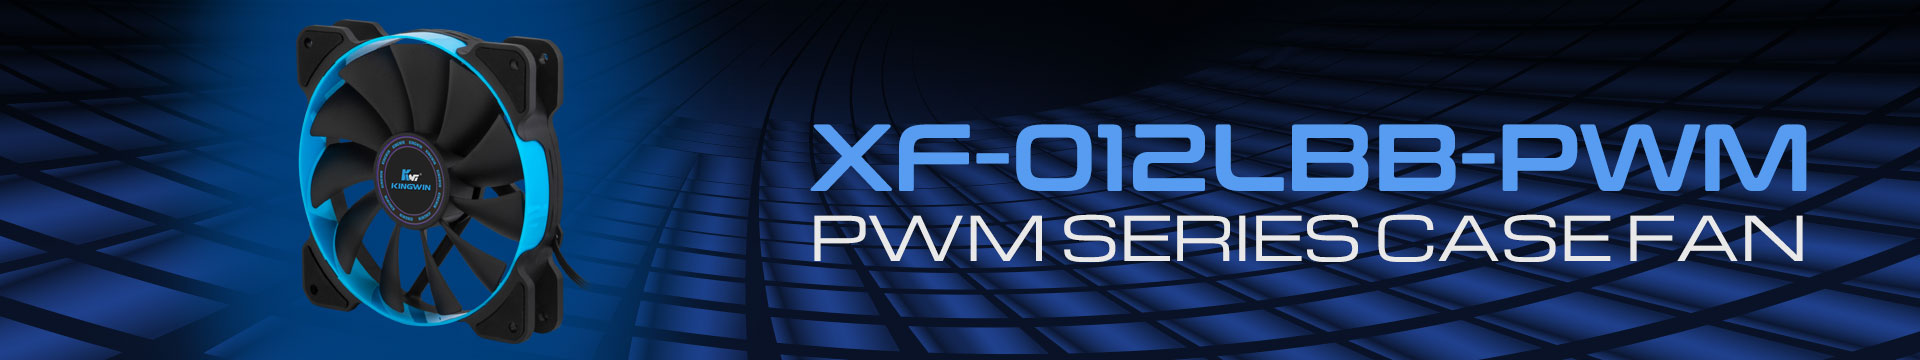 XF-012LBB-PWM_WEB_BANNER